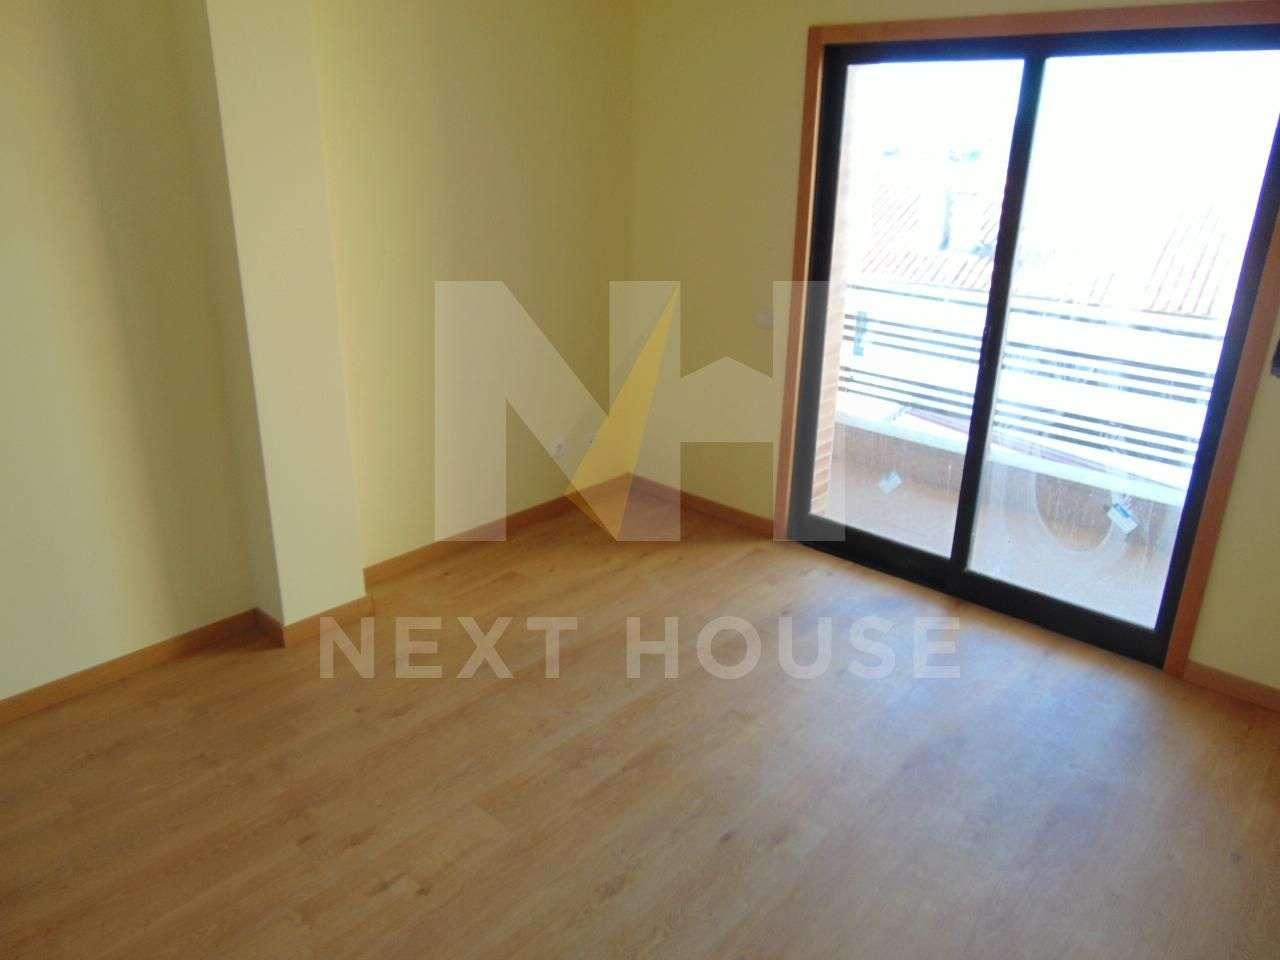 Apartamento para comprar, Gafanha da Boa Hora, Aveiro - Foto 10